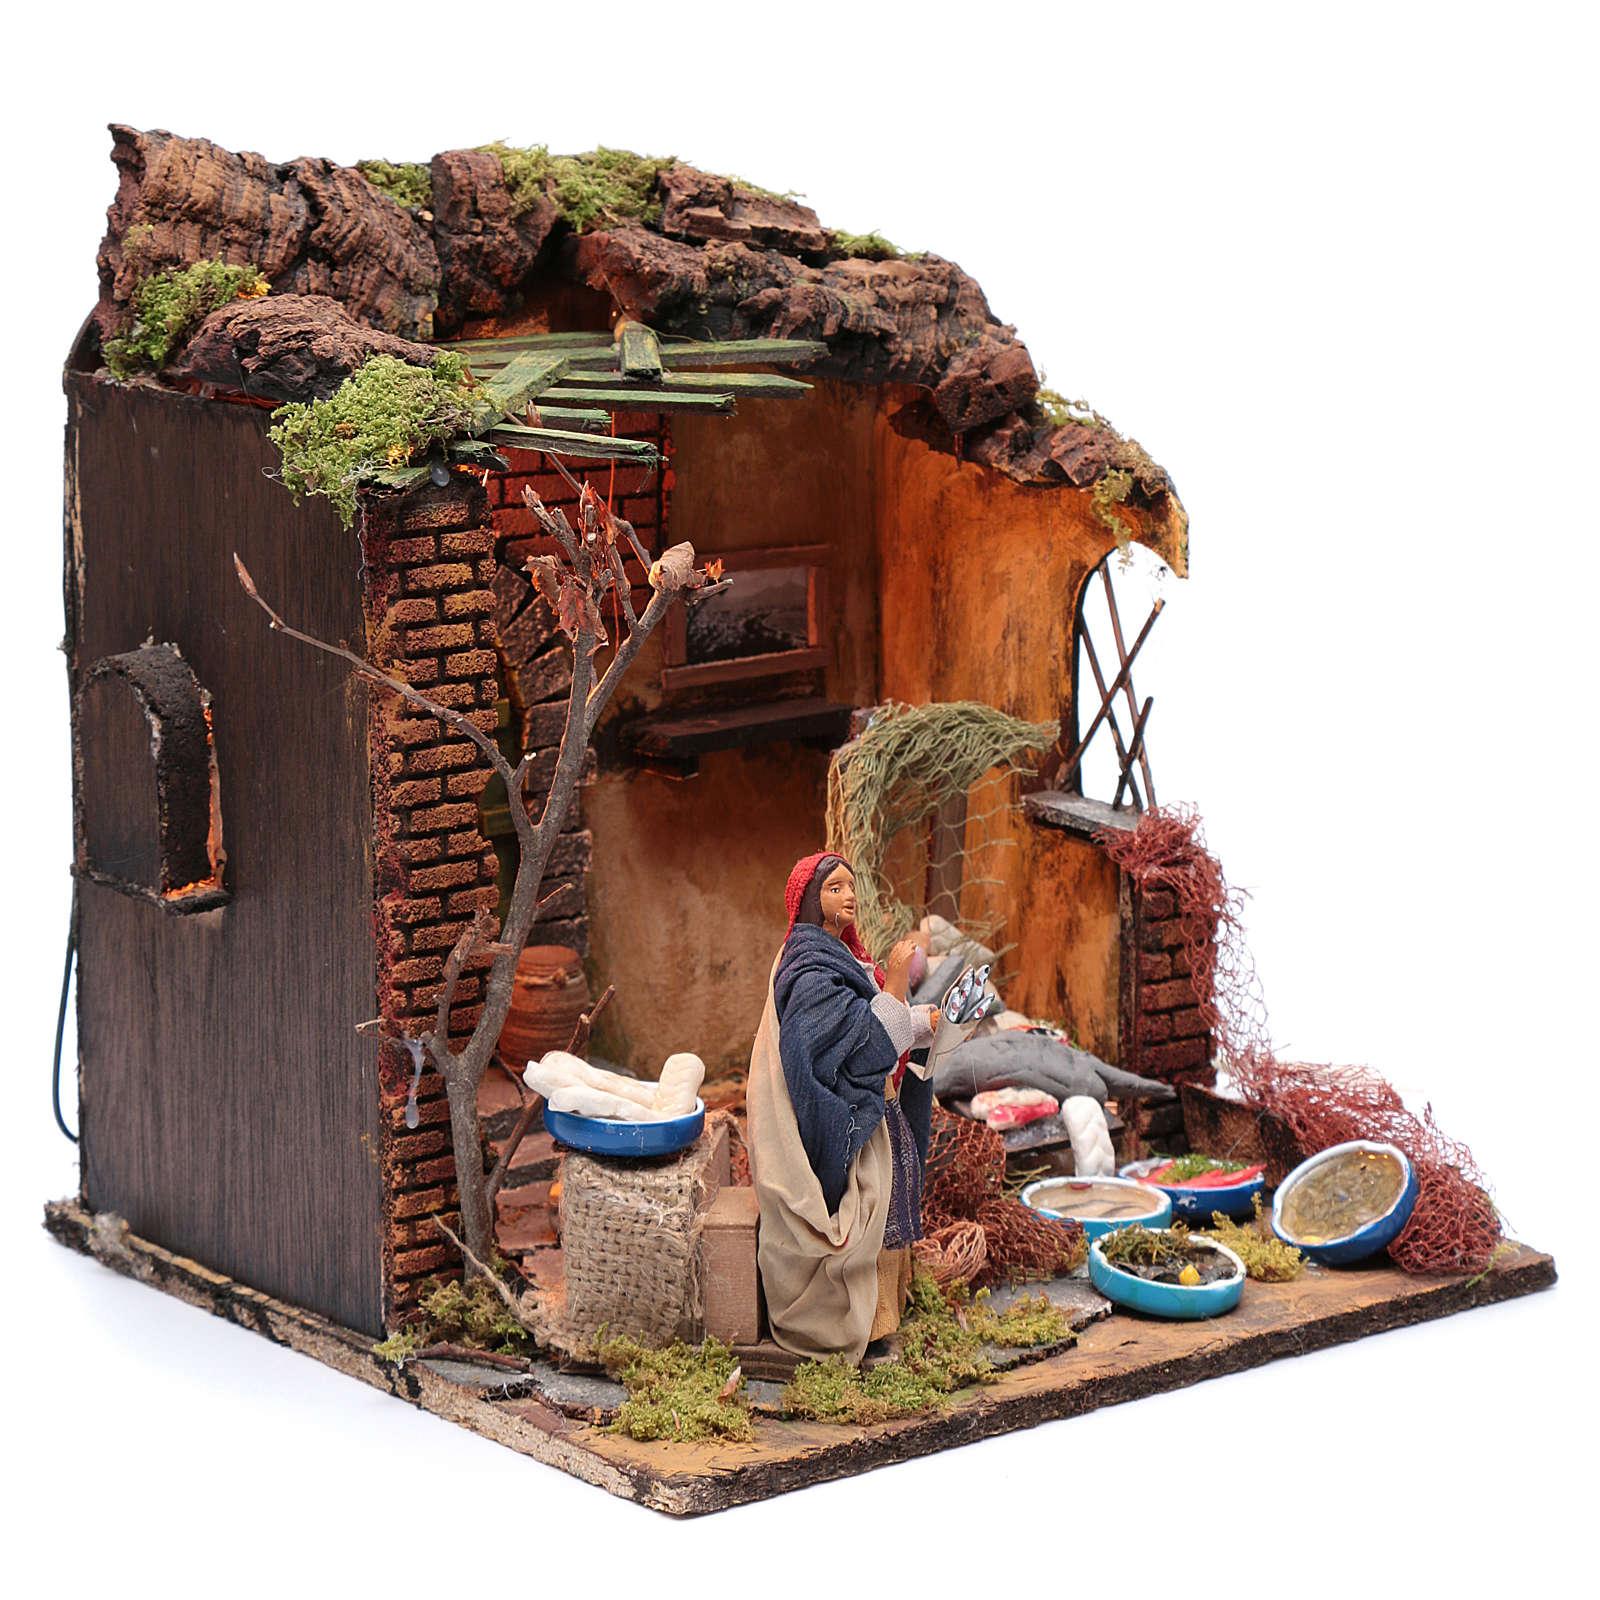 Moving woman fishmonger setting 12 cm for Neapolitan nativity scene 4